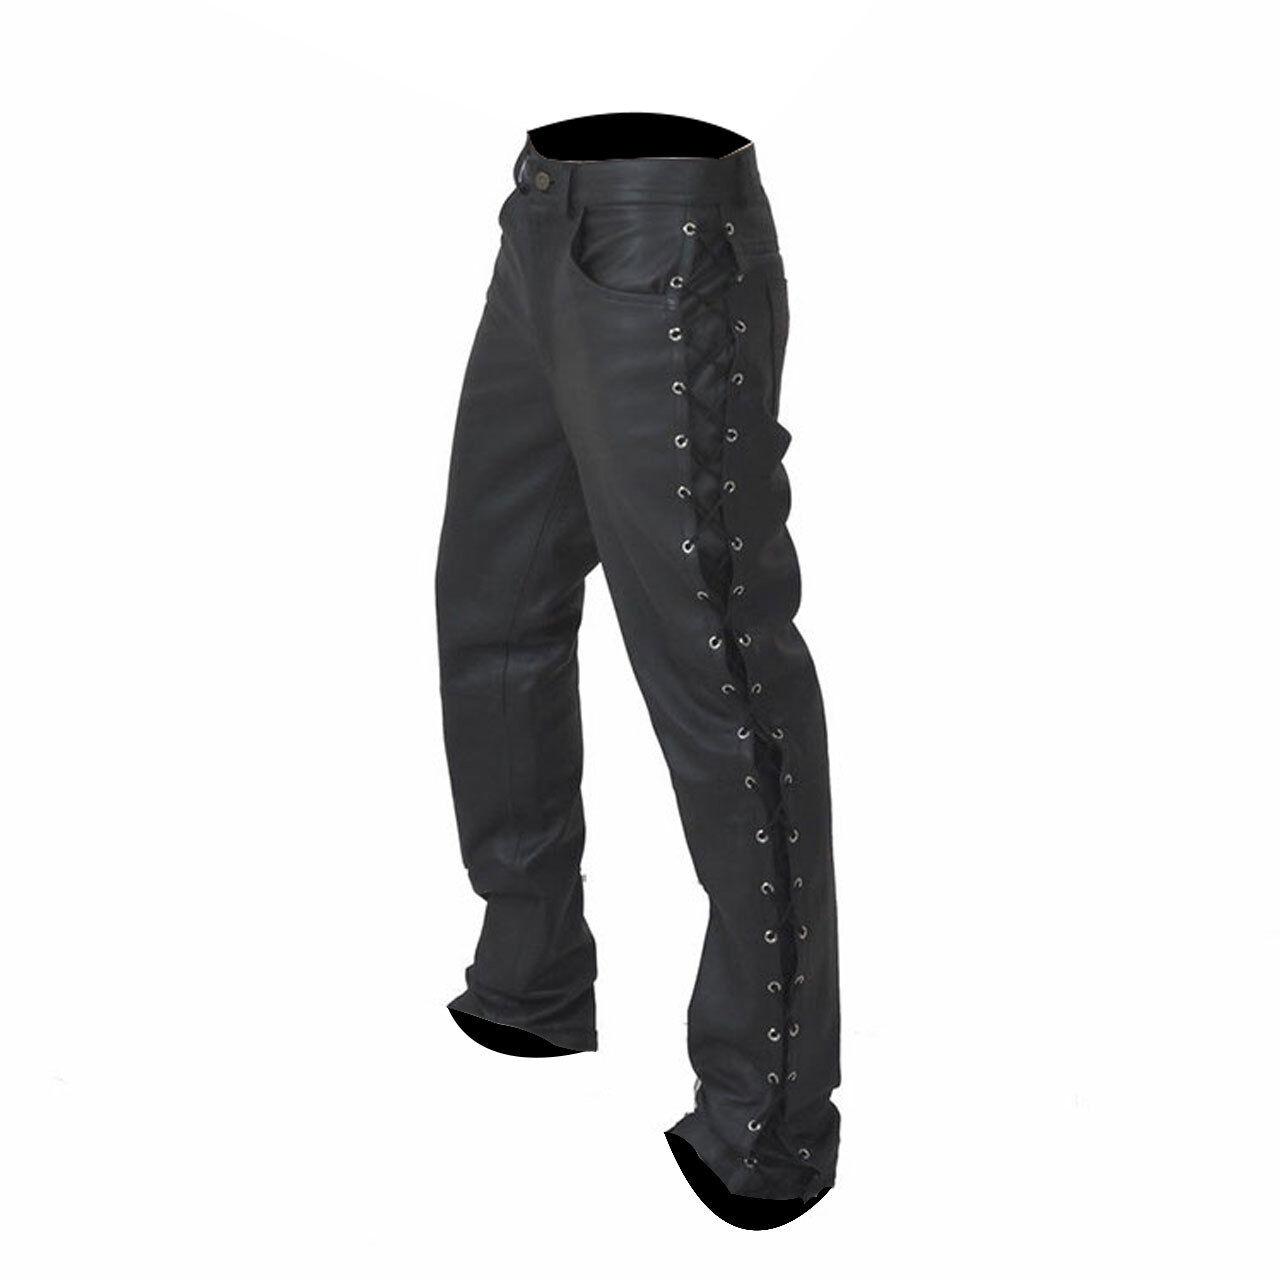 Uomo Biker Pantaloni Vero Nero pelle Sexy Lato Pizzo Jeans